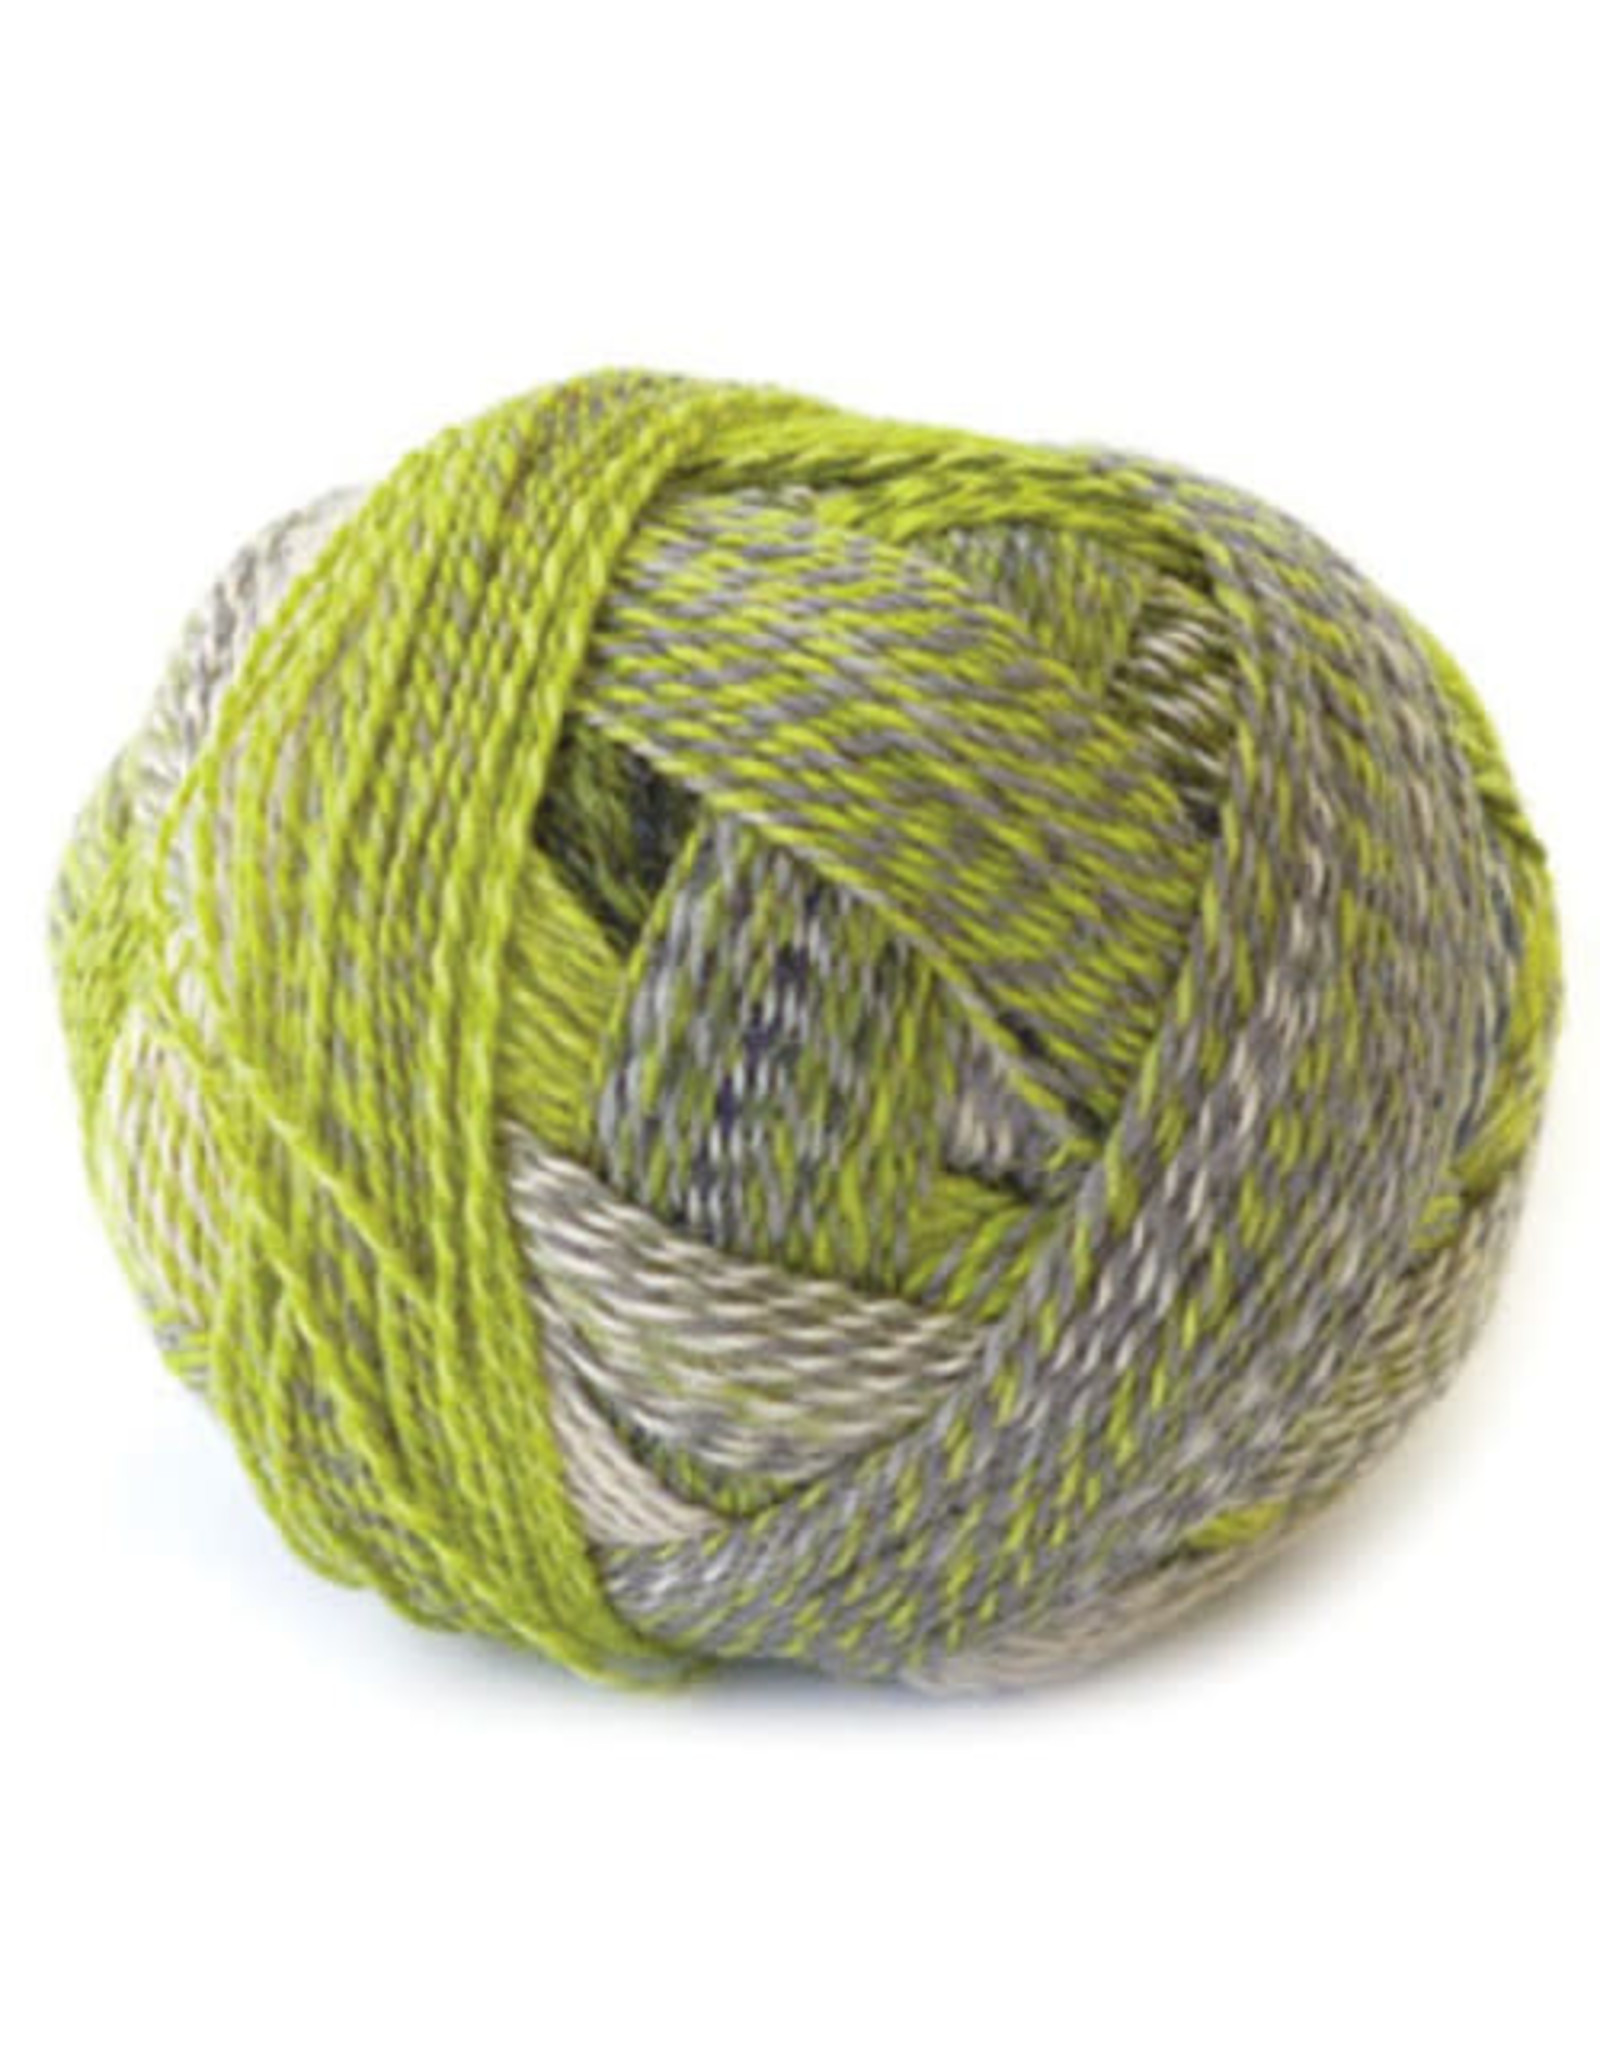 Scoppel-Wolle 2204 - Zauberball Crazy - Schoppel Wolle